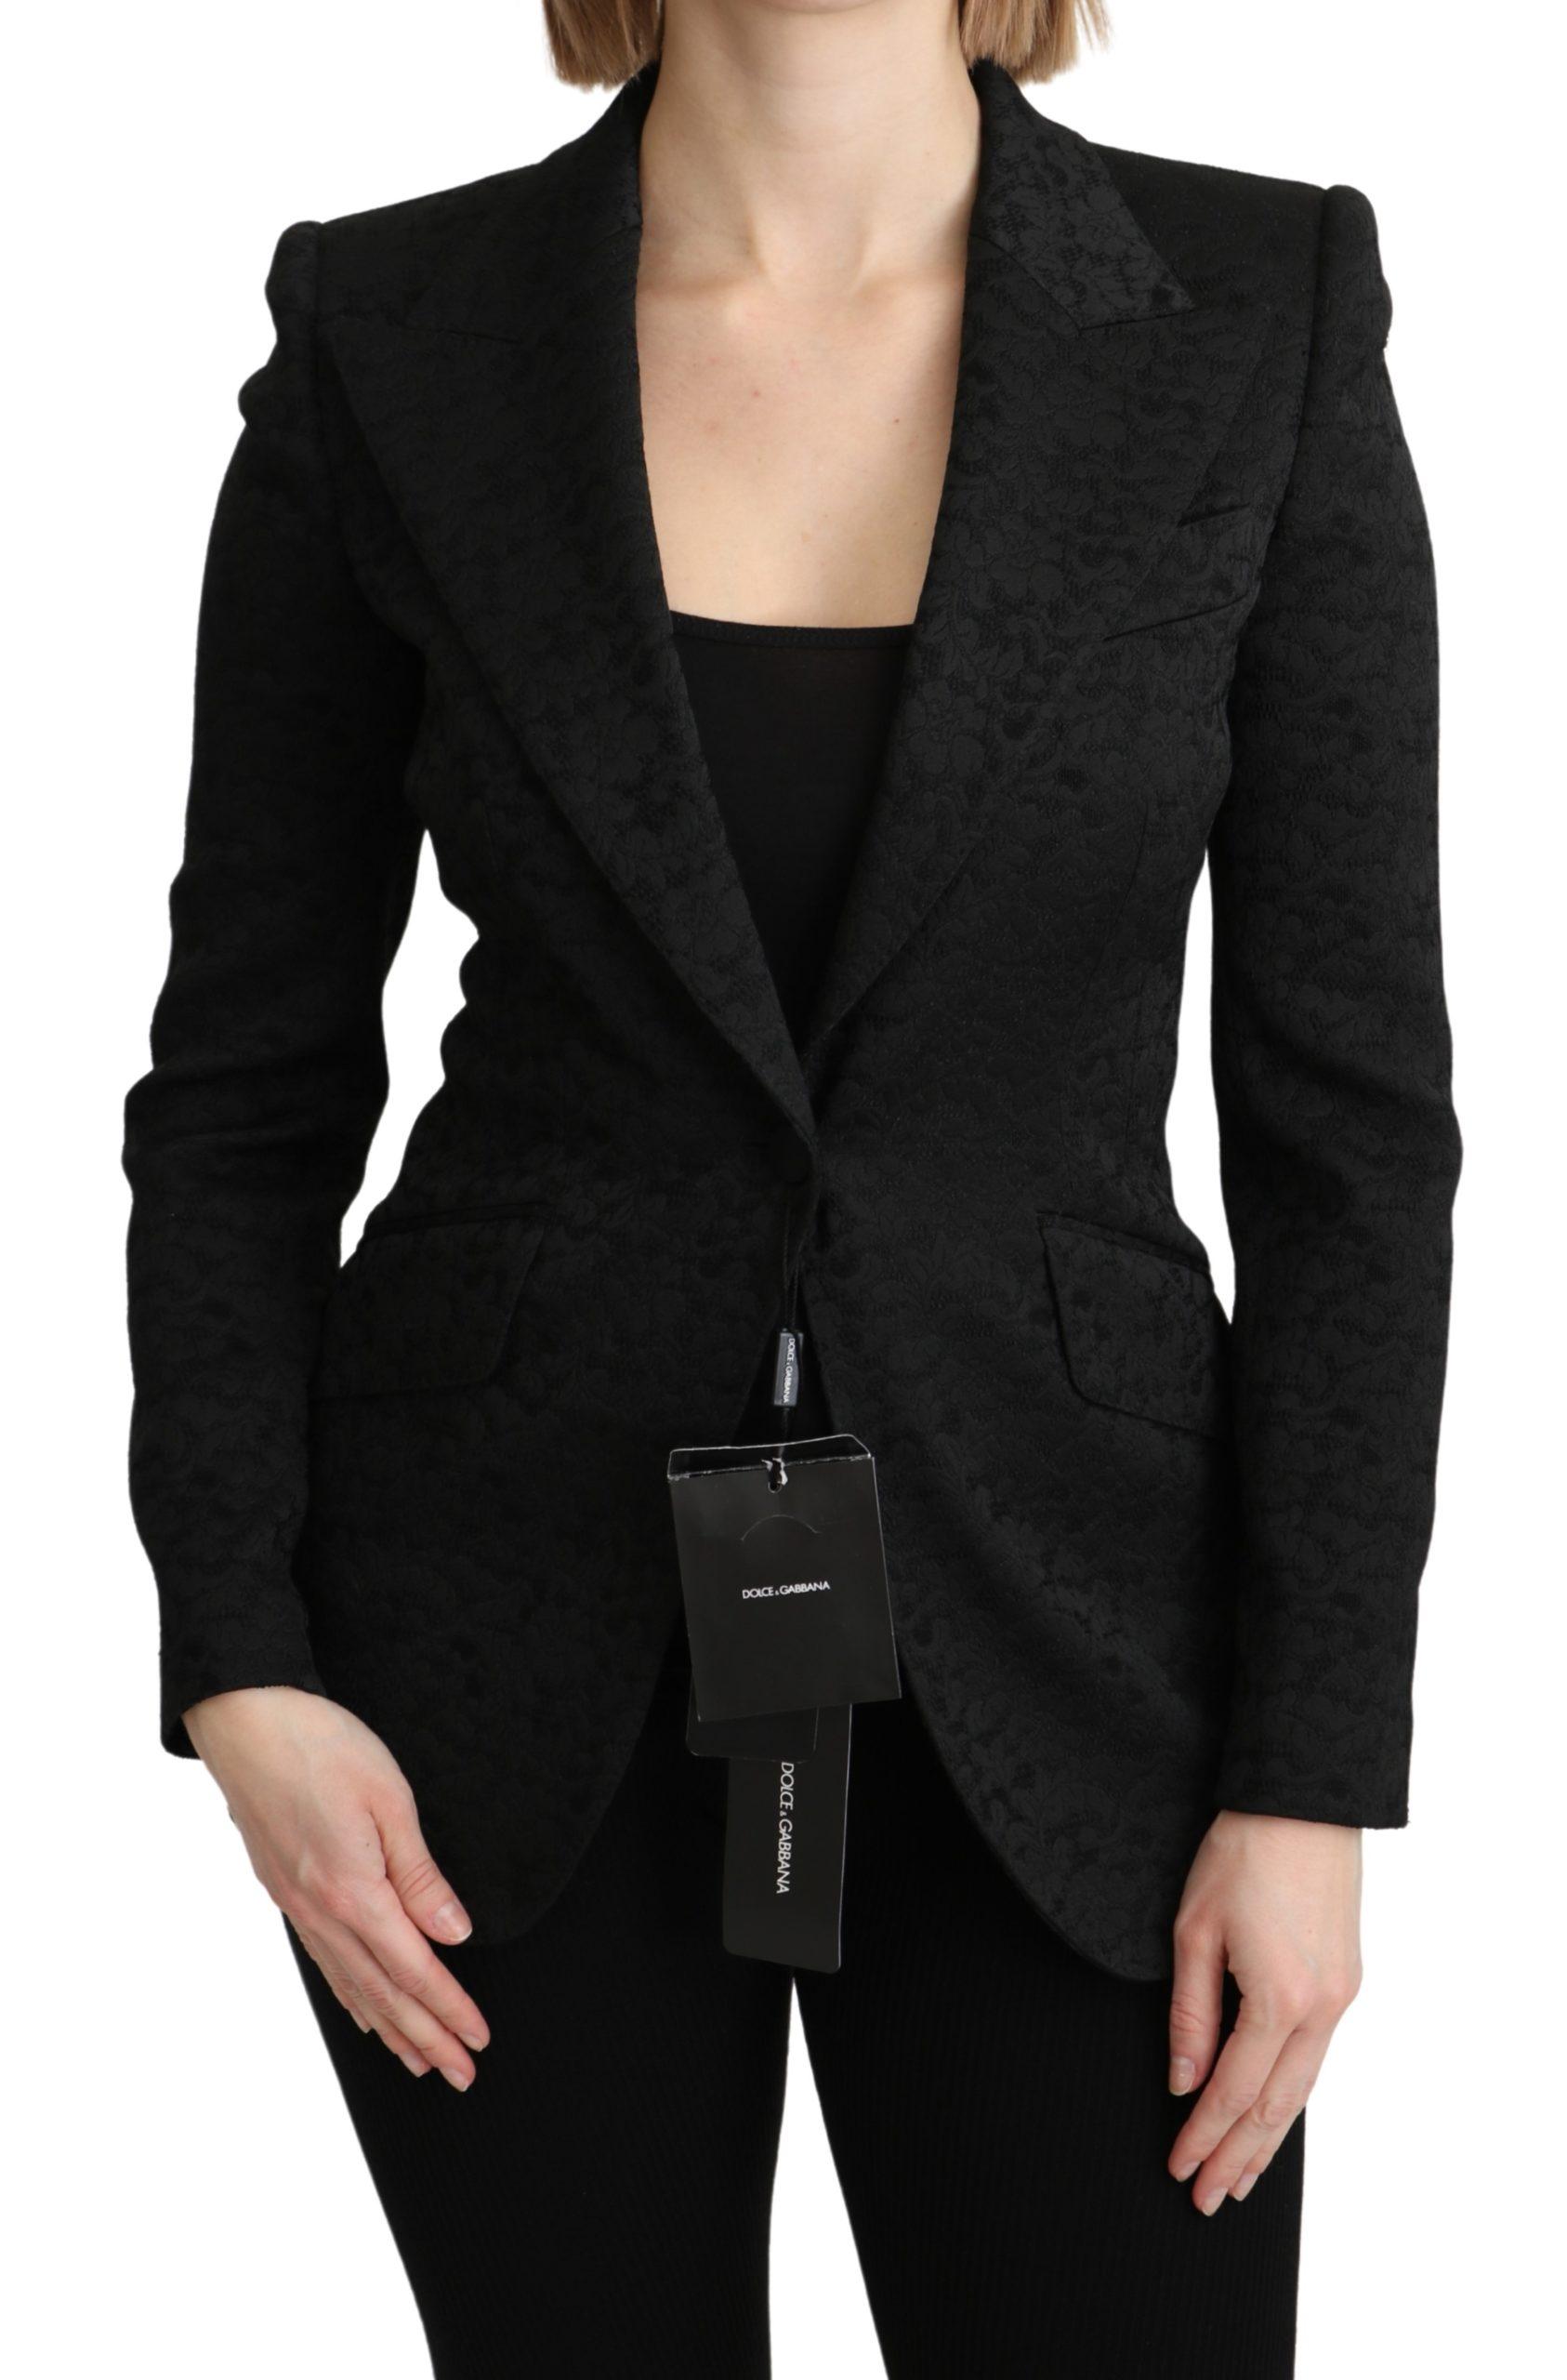 Dolce & Gabbana Women's Brocade Single Breasted Blazer Black KOS1794 - IT36 | XS